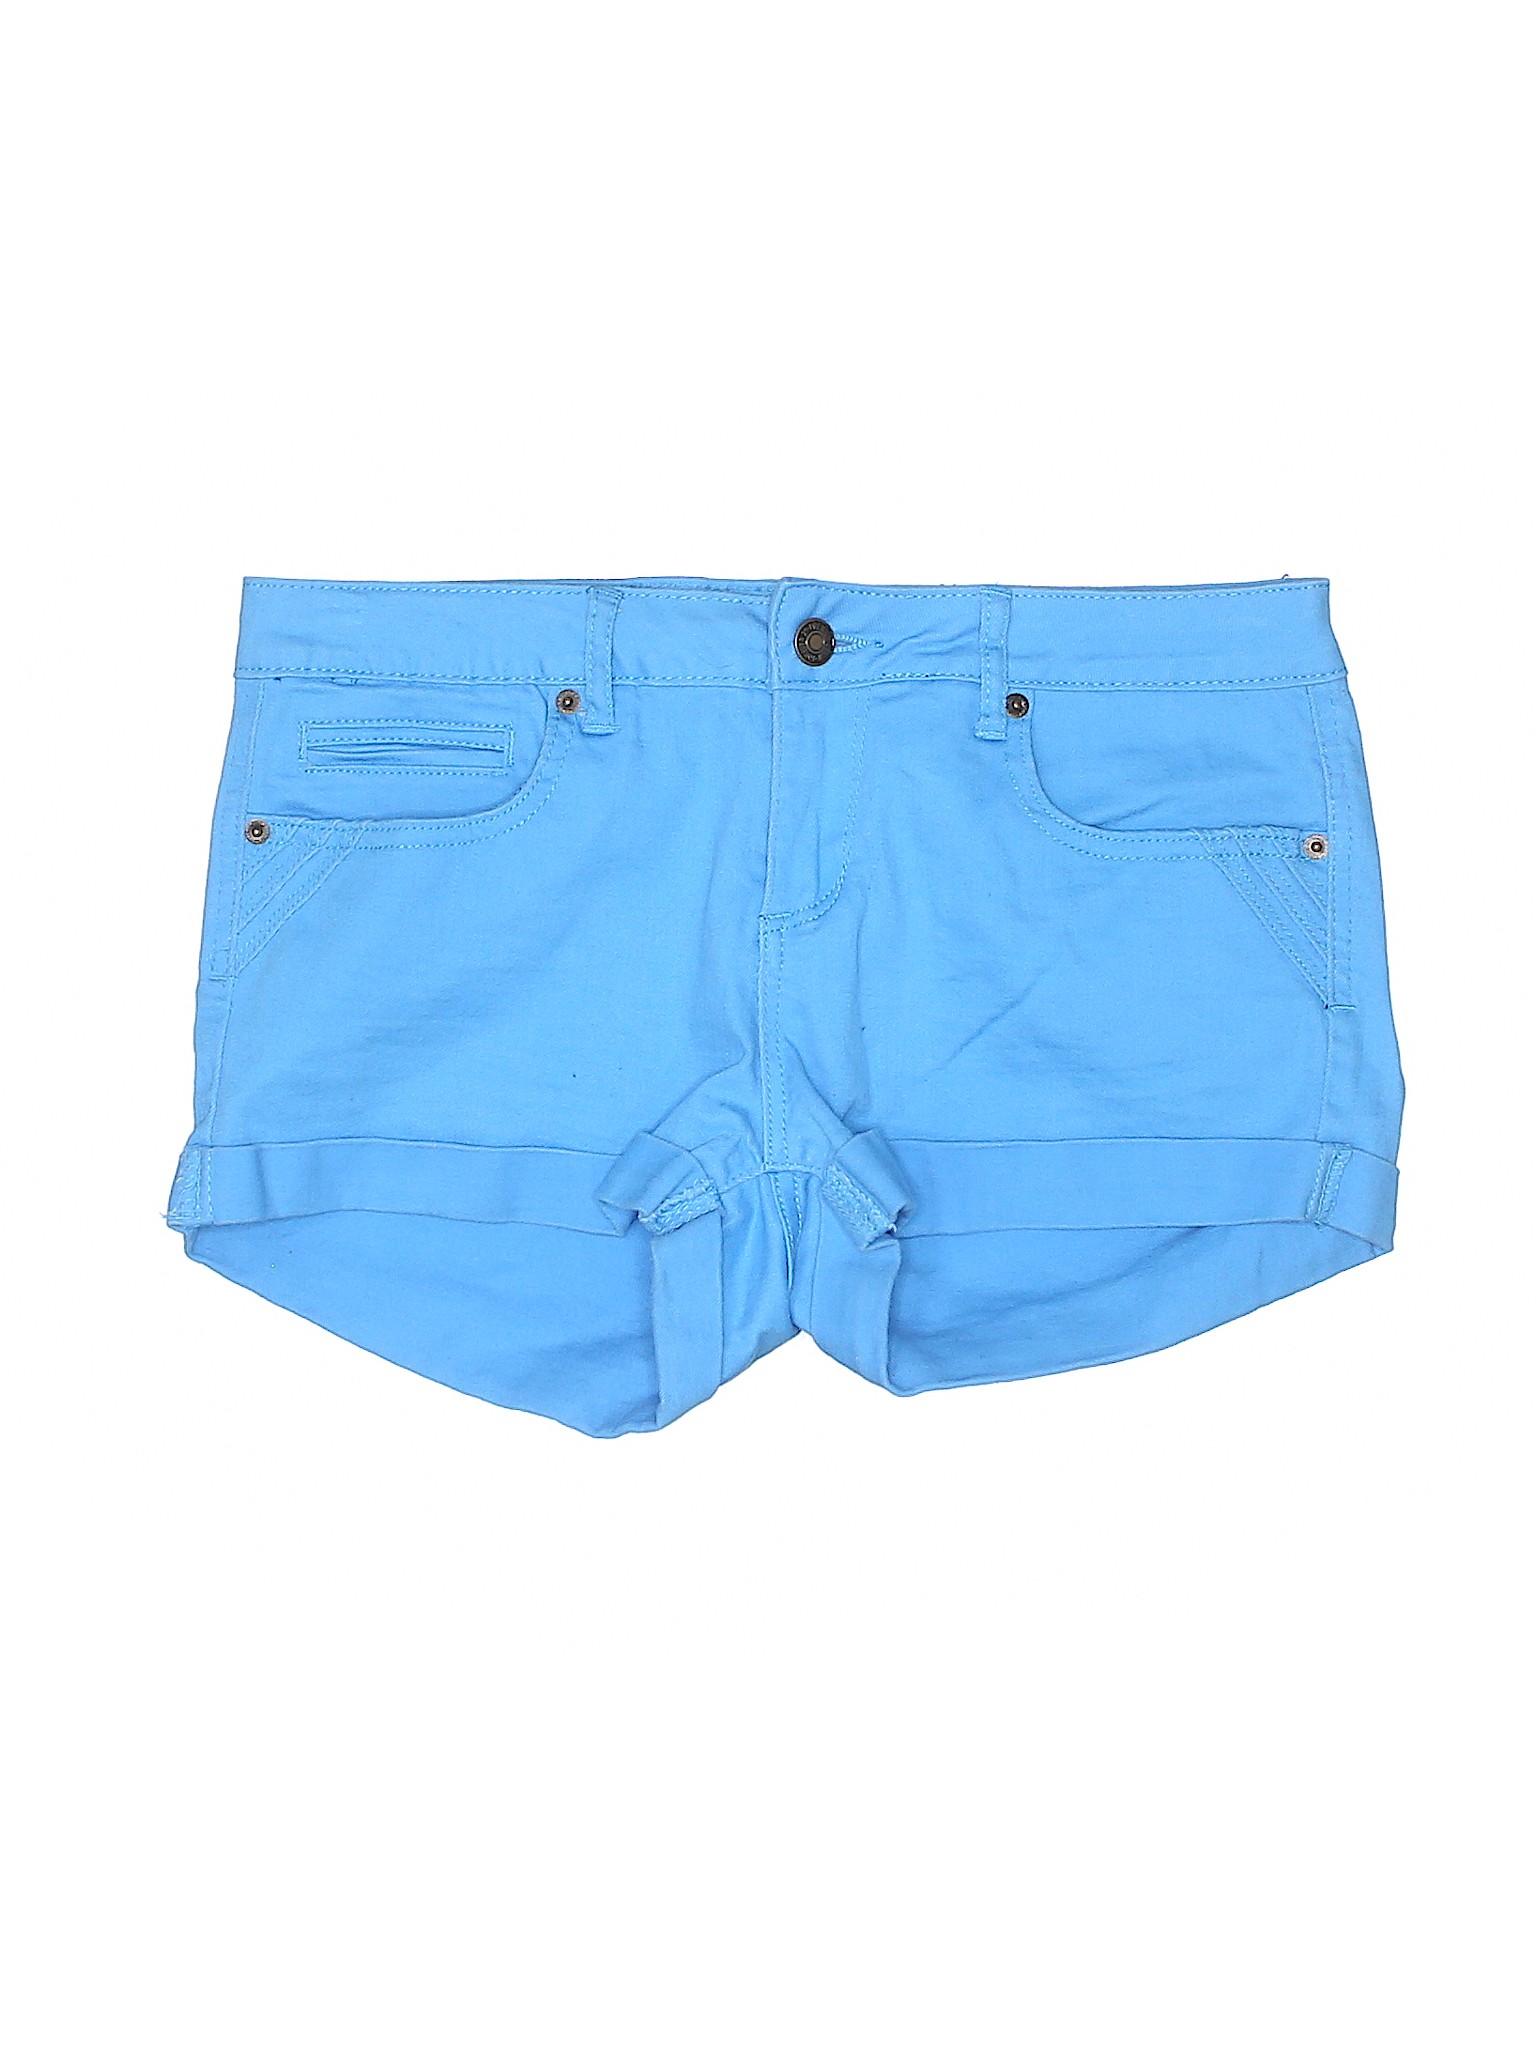 21 21 Boutique Forever Boutique Denim Forever Shorts Forever Boutique Denim Shorts n8SOHqOxdw